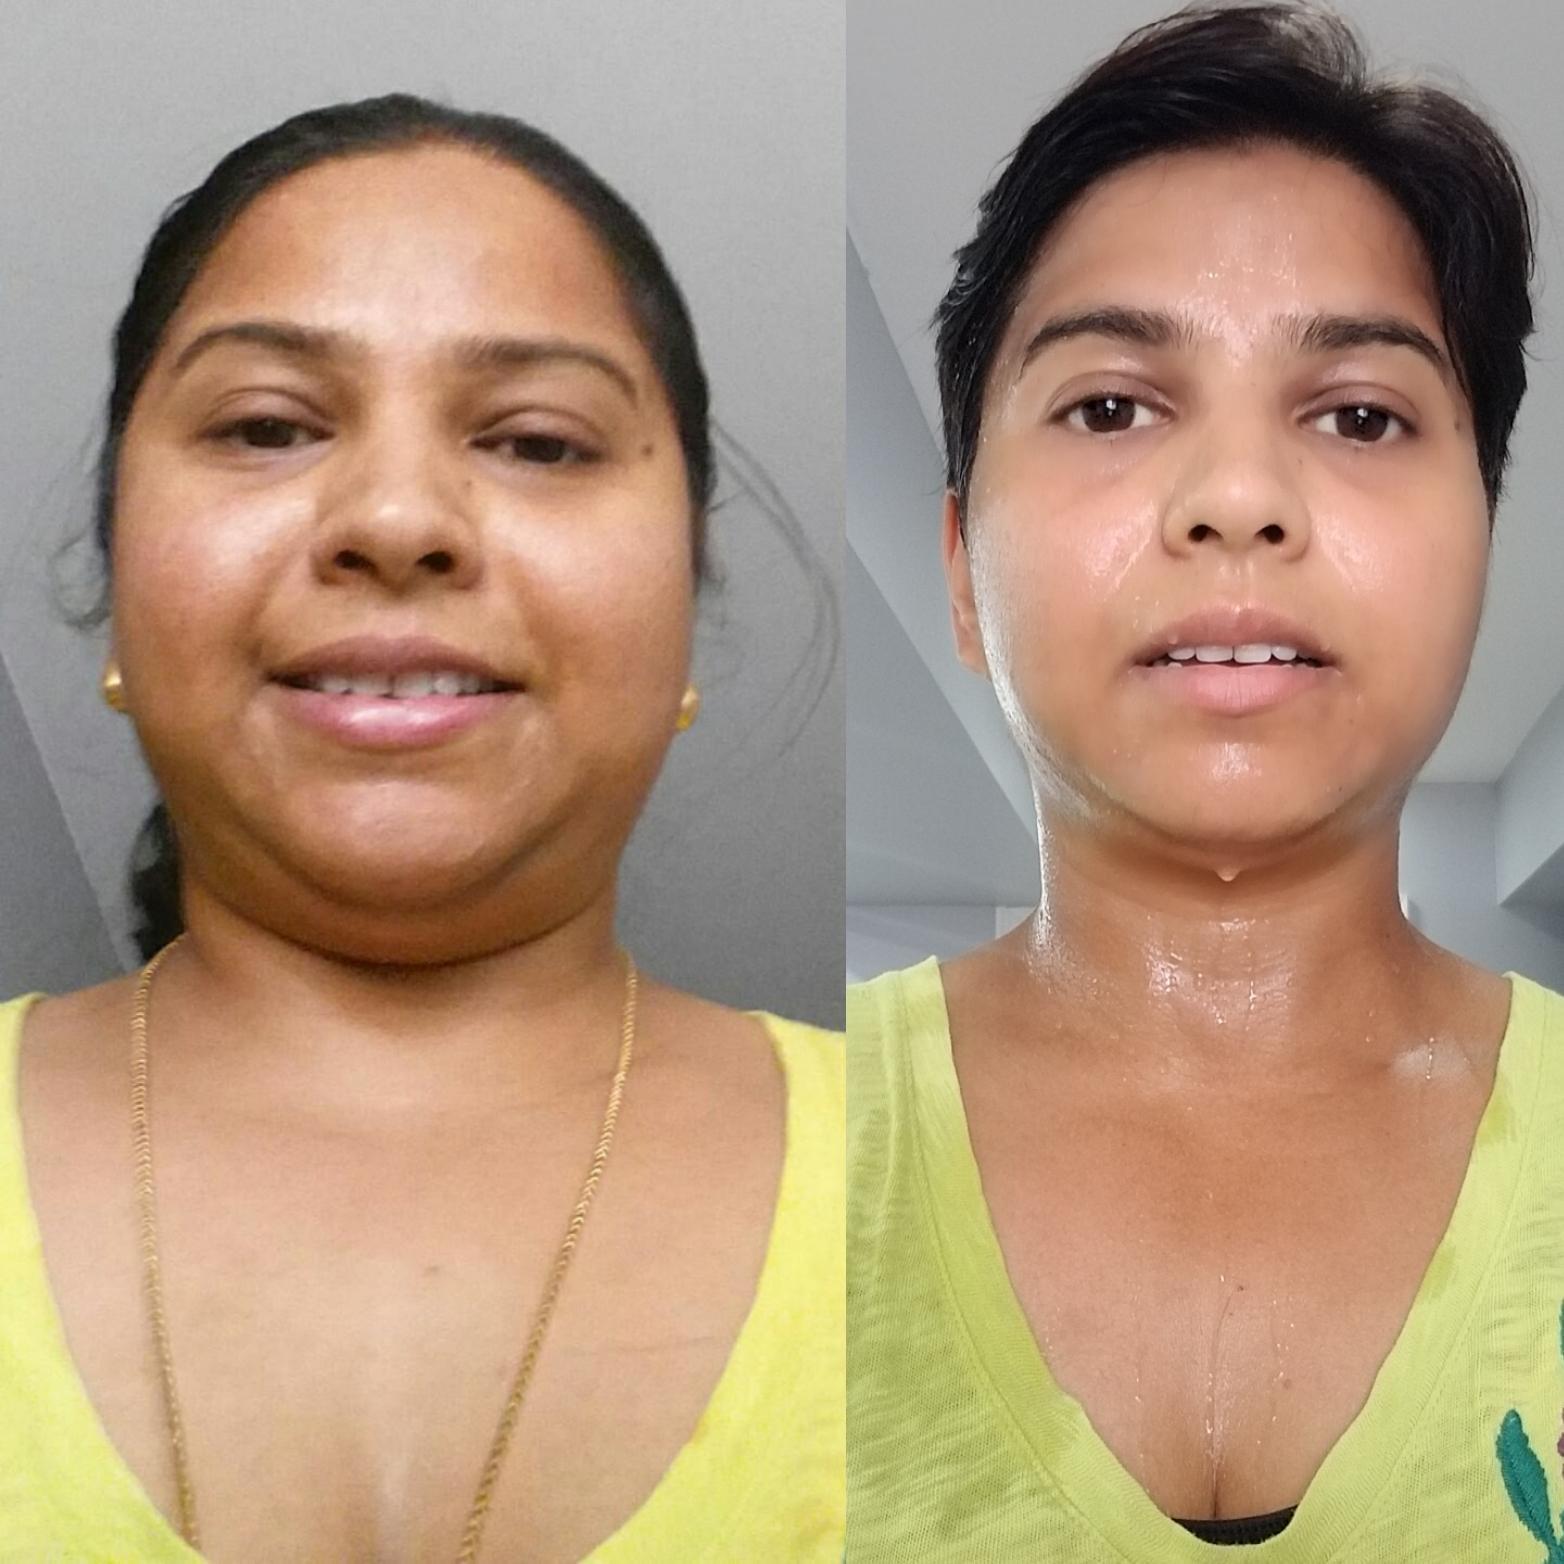 5'3 Female 51 lbs Weight Loss 211 lbs to 160 lbs